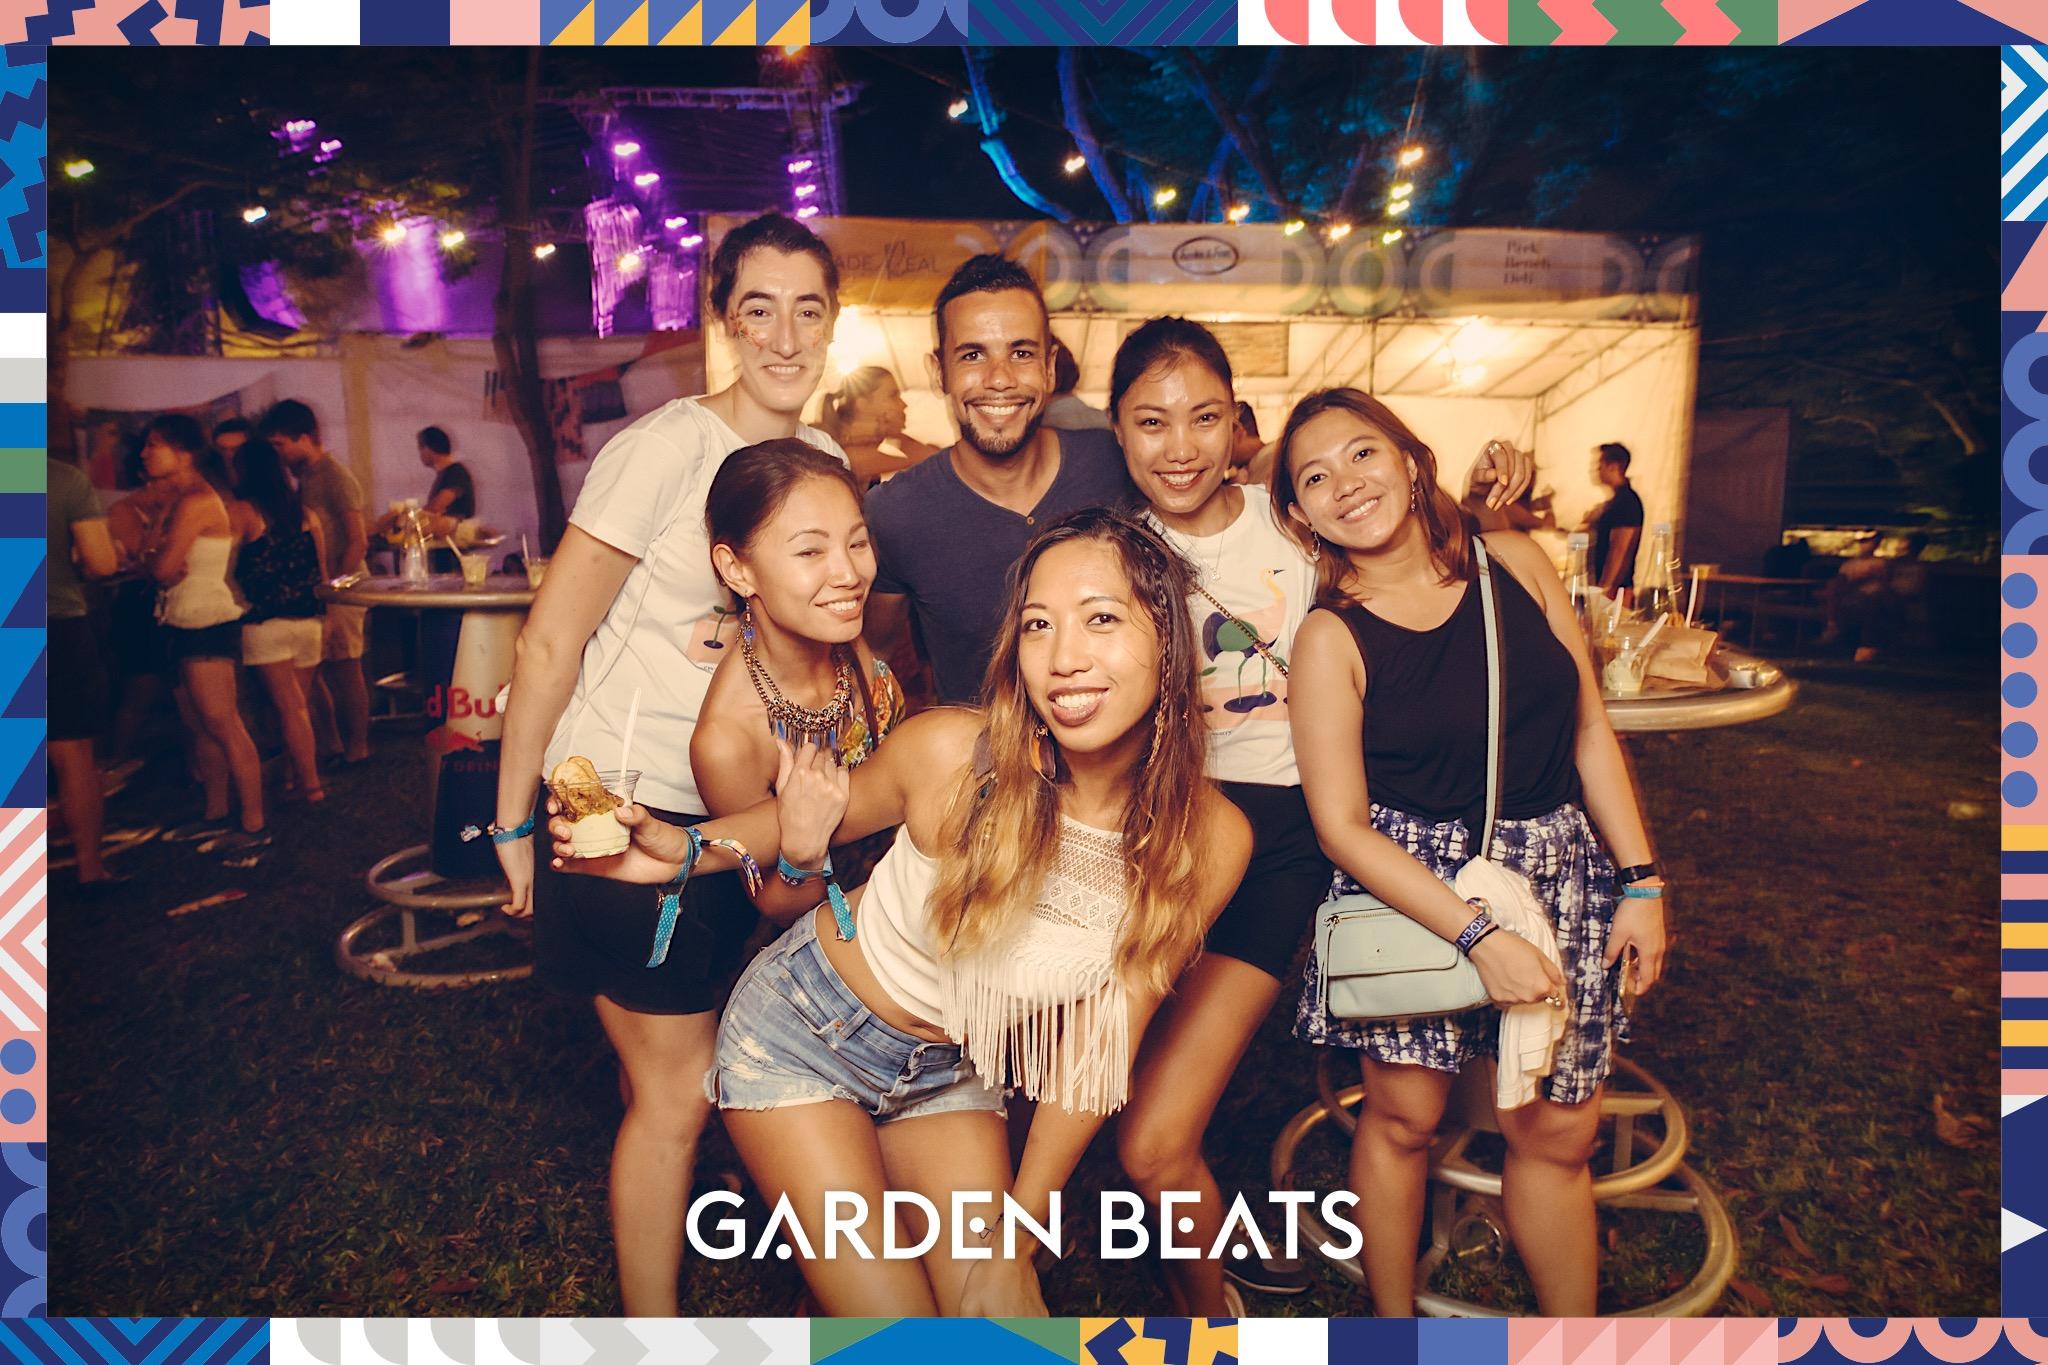 18032017_GardenBeats_Colossal875_WatermarkedGB.jpg